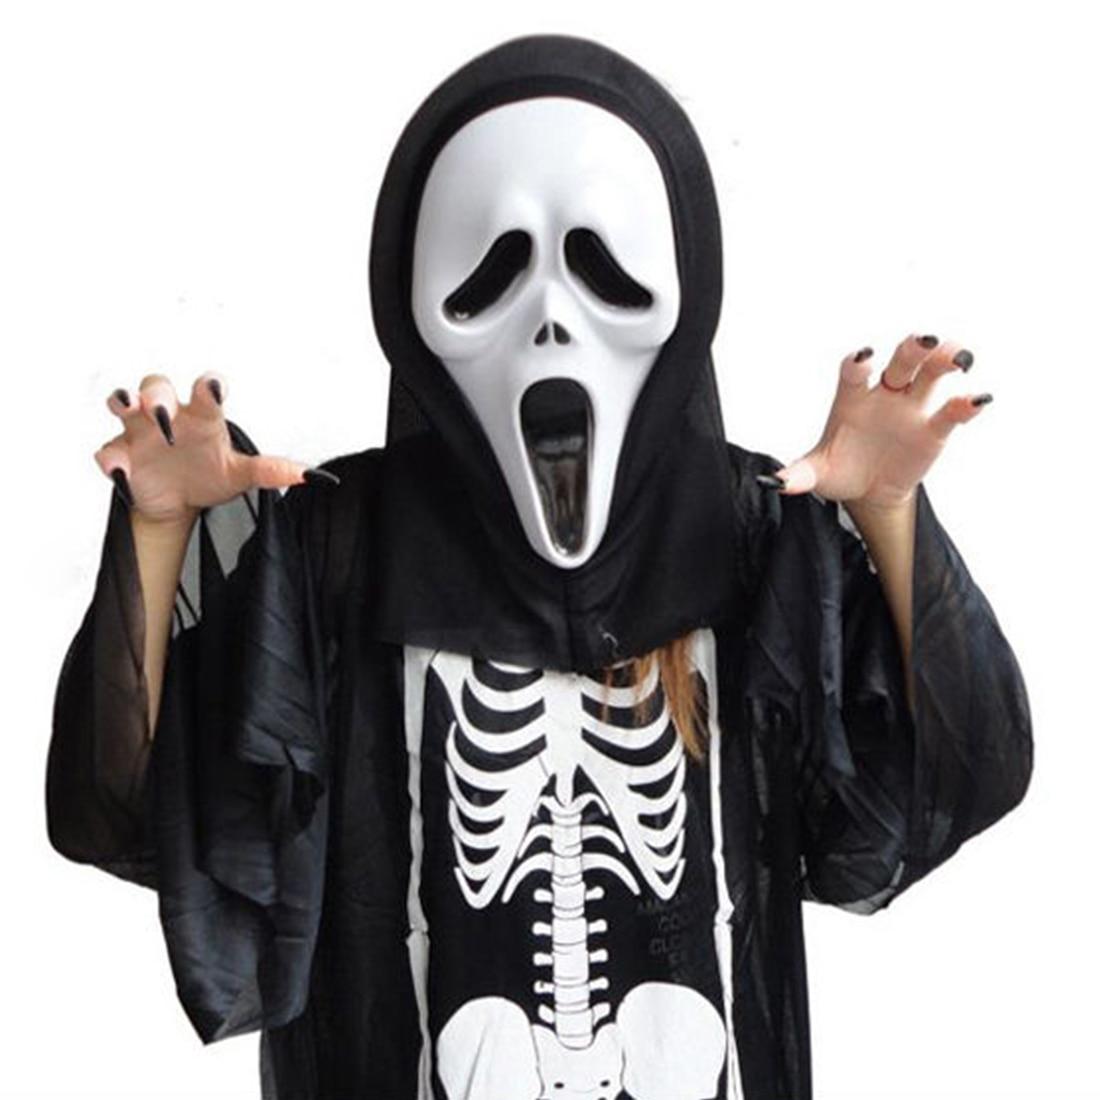 Aliexpress.com : Buy 2016 1Pc Scary Ghost Face Scream Mask Creepy ...